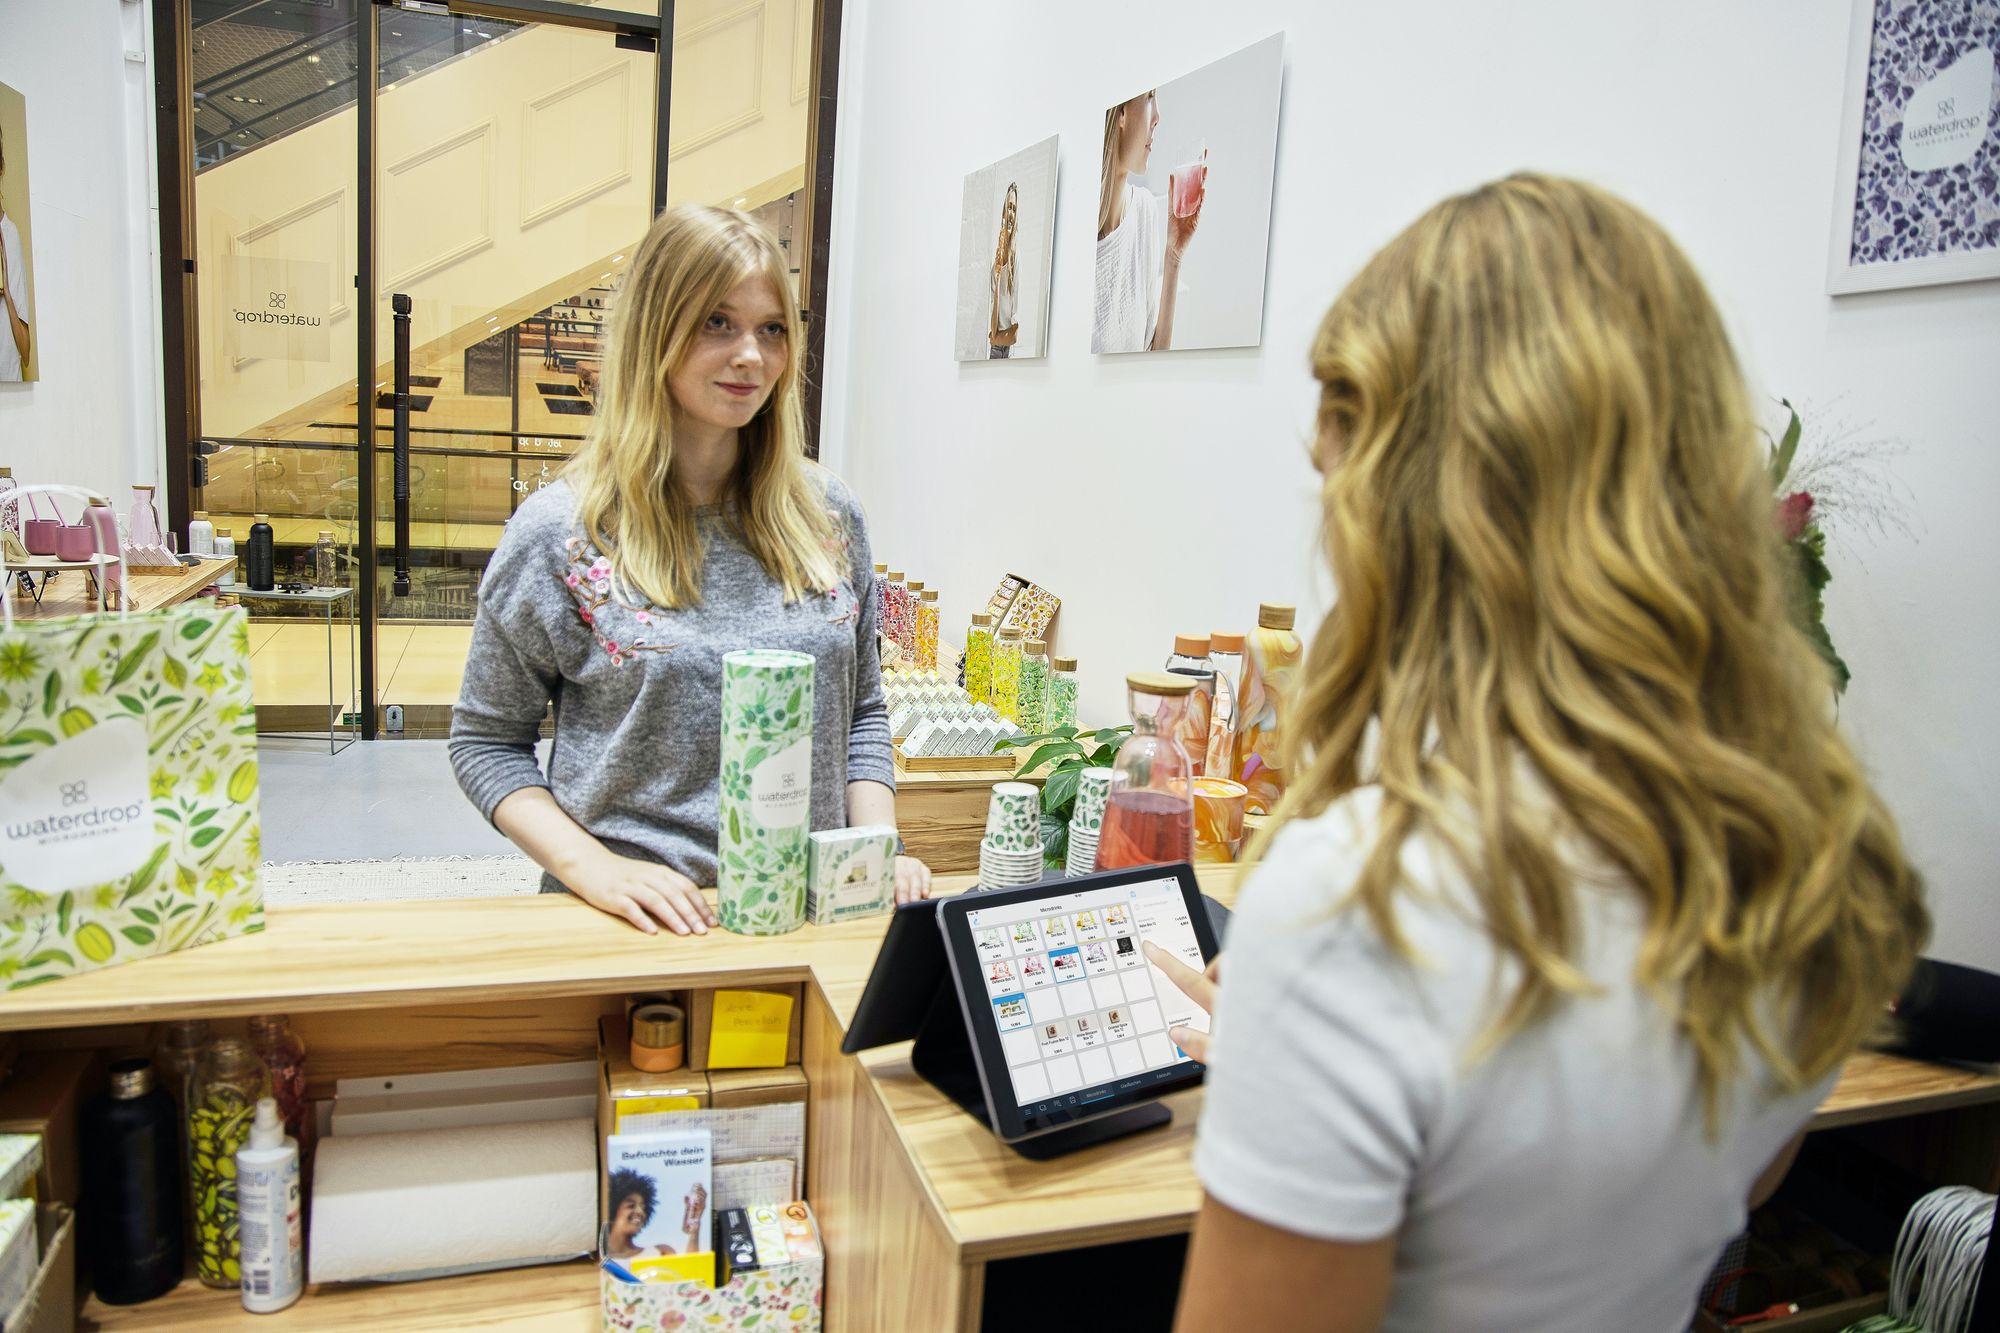 Retailers or Merchants of Performance Marketing